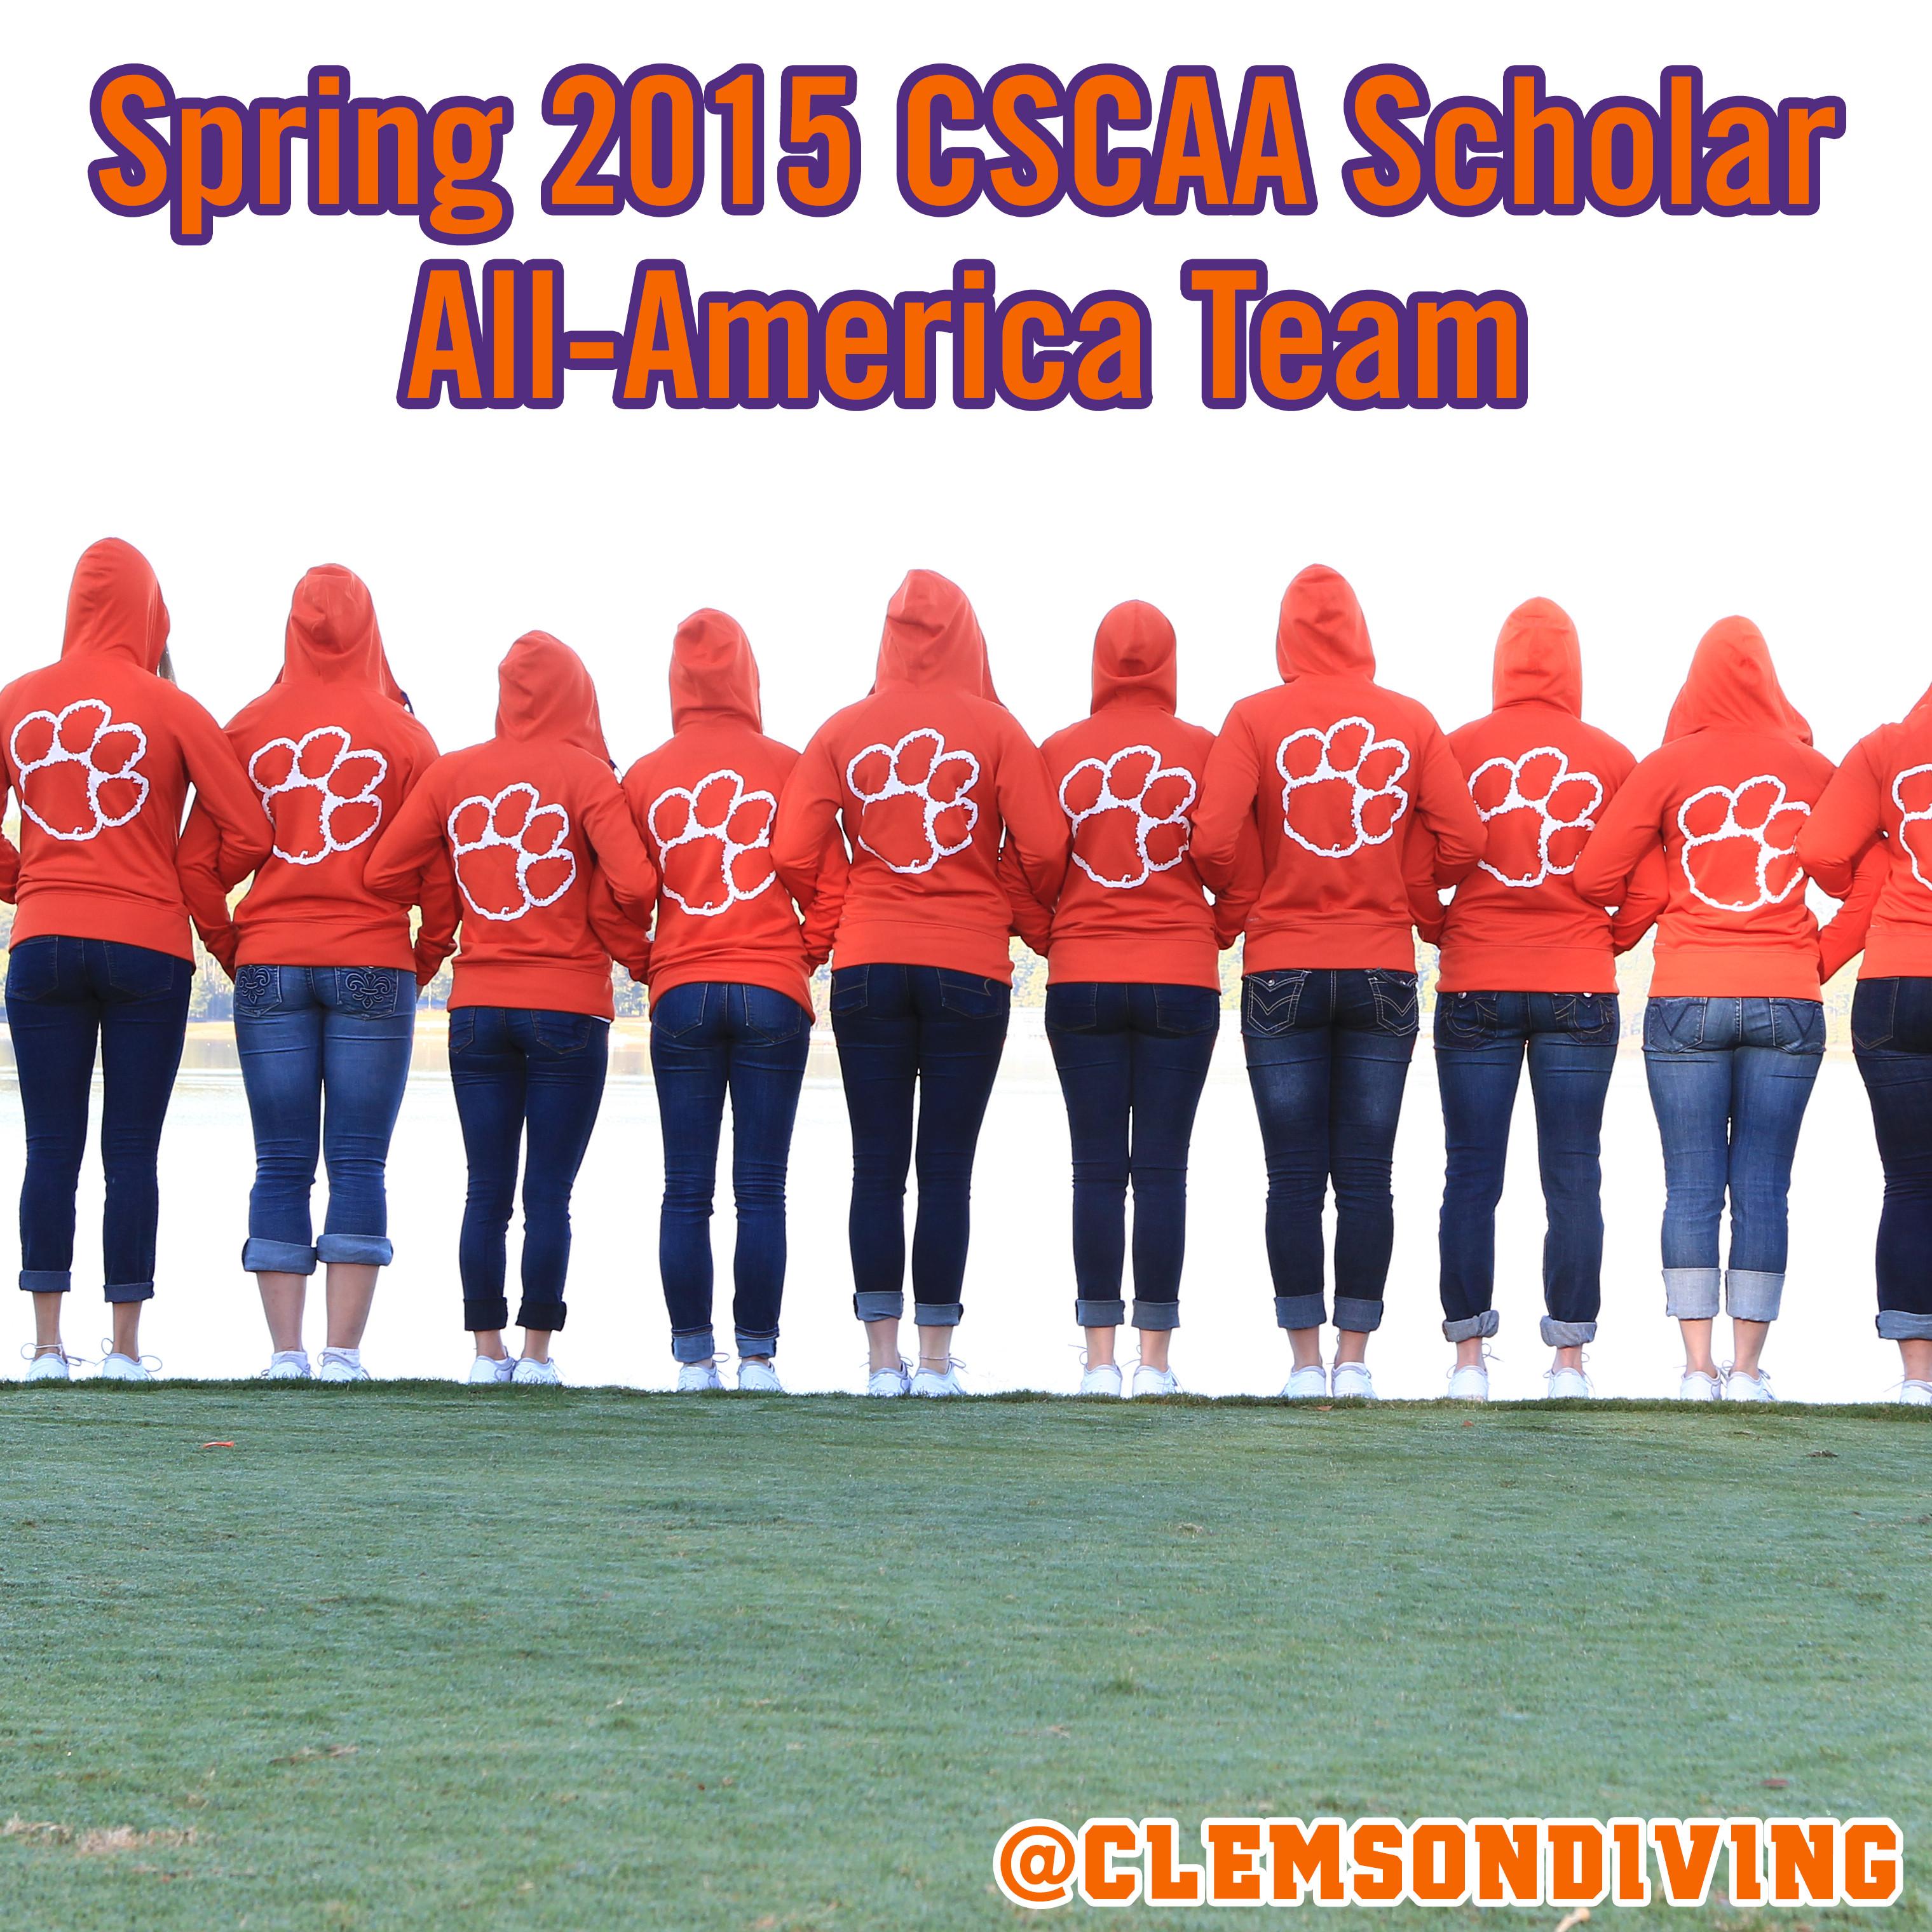 Clemson Named Scholar All-America Team for Sixth Straight Semester